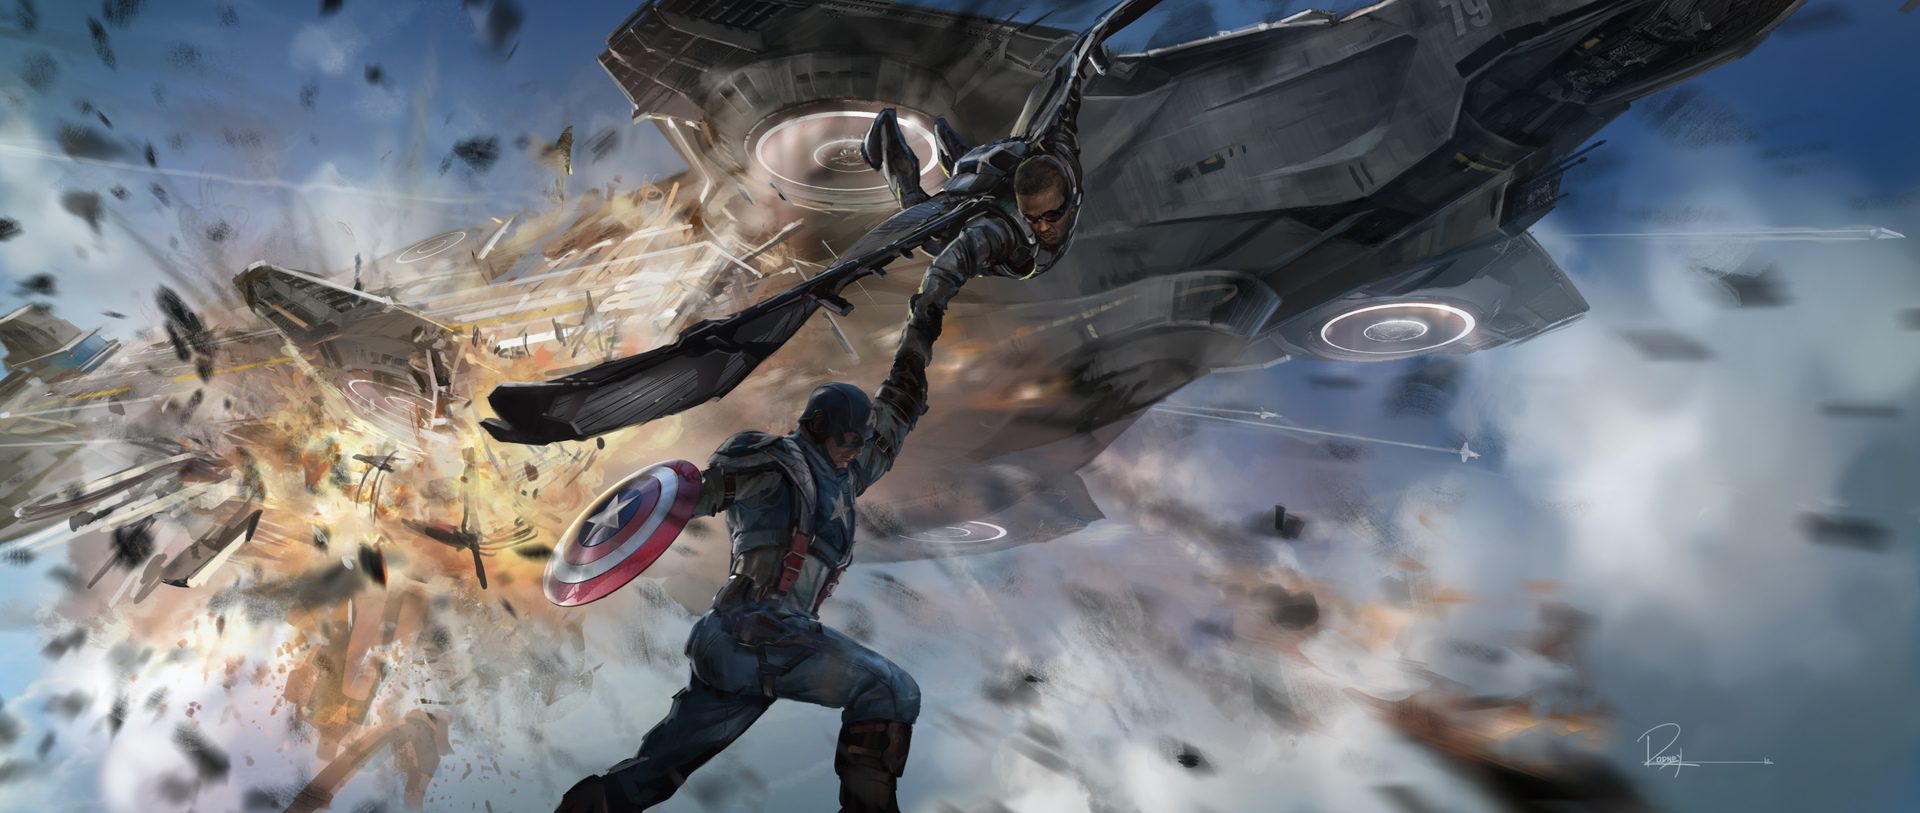 Captain America Winter Soldier Concept Art